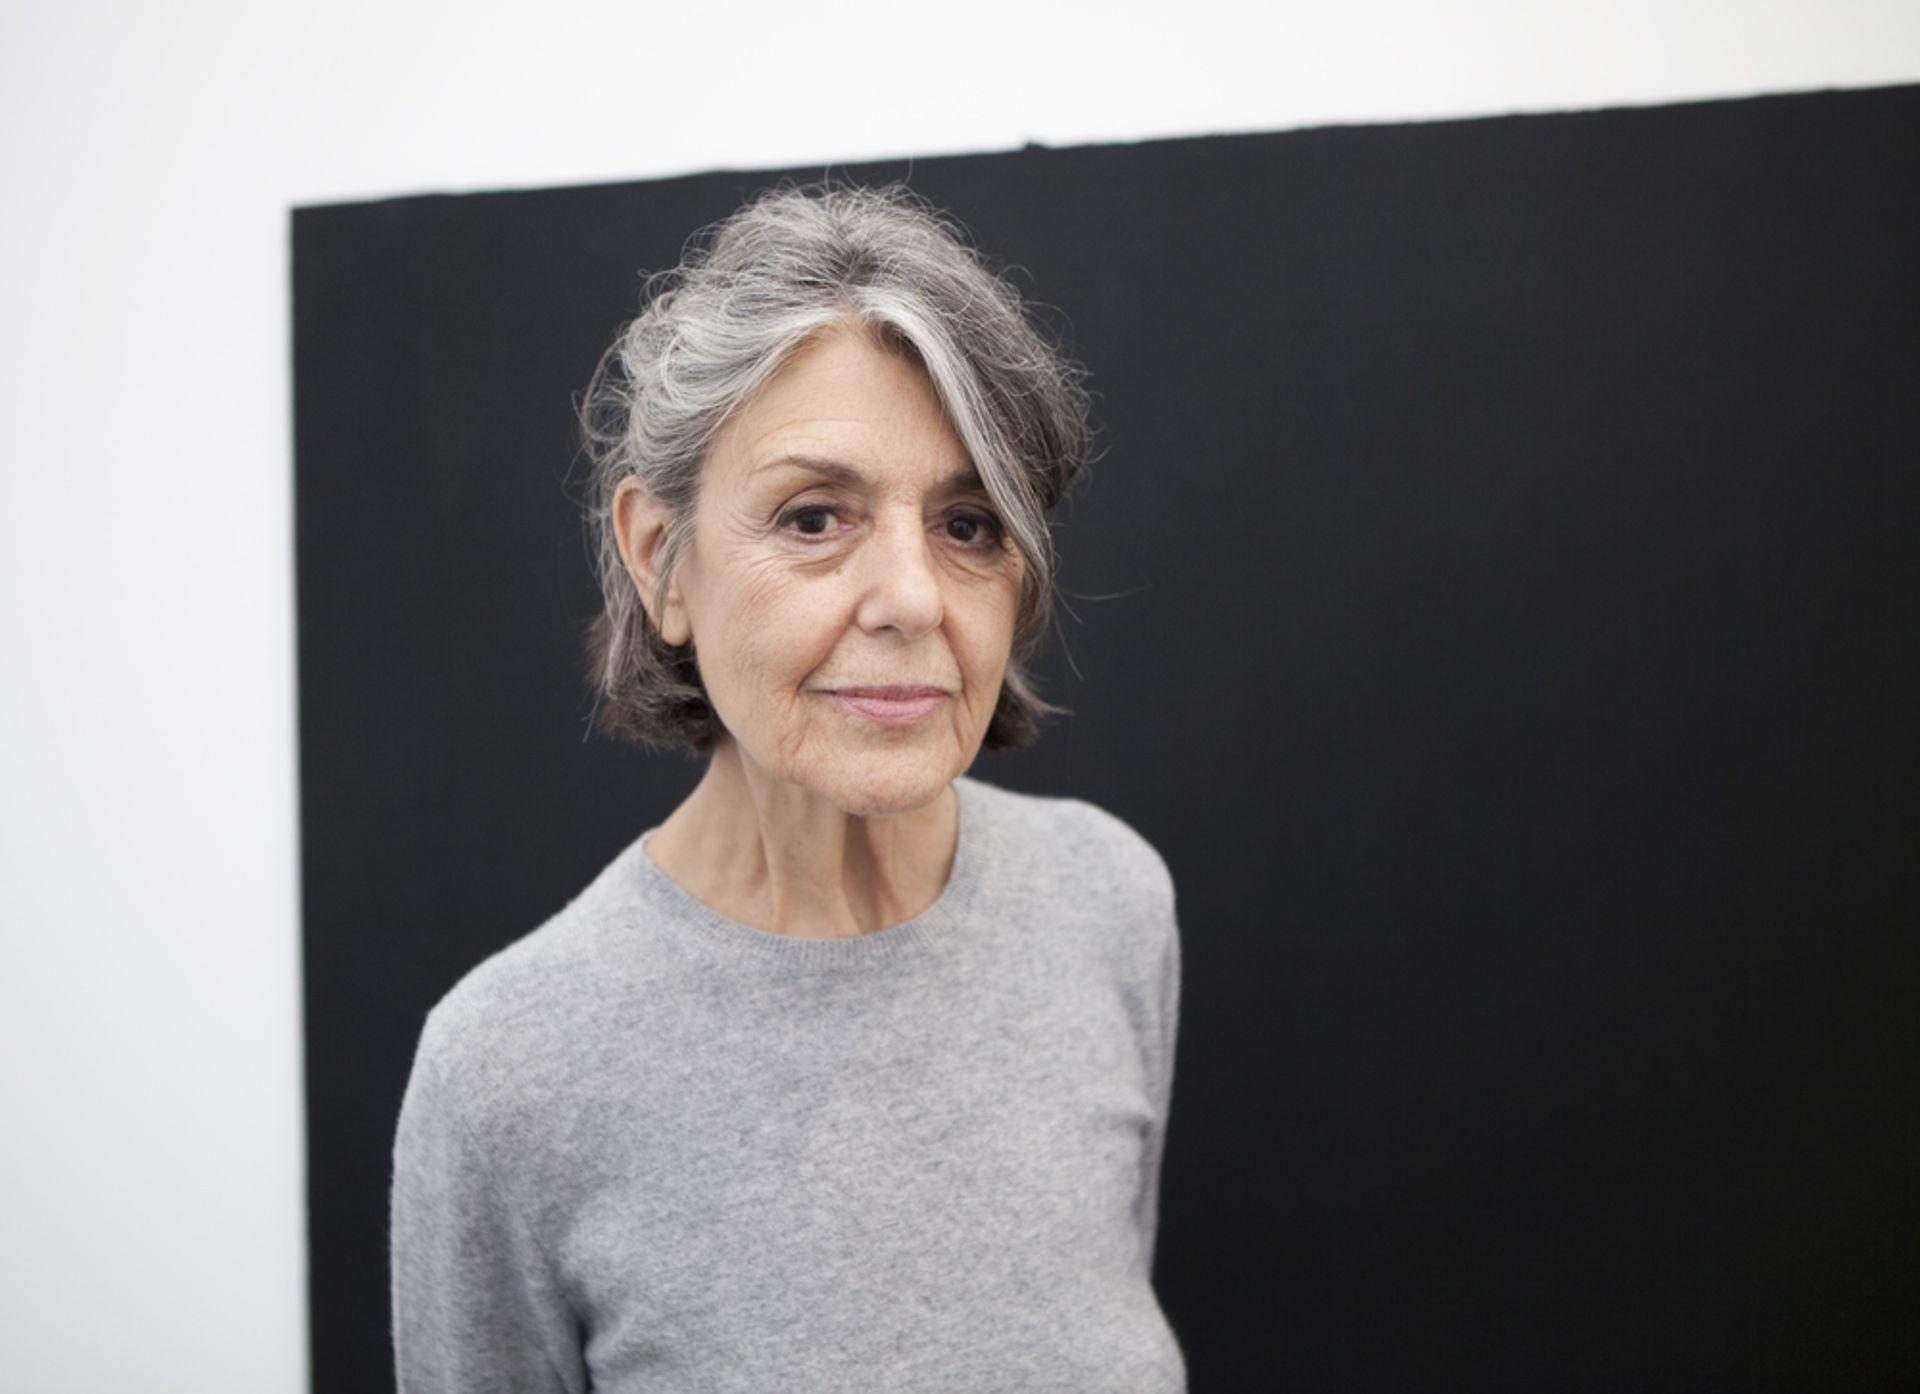 Paula Cooper, 2015 Photo: David Owens